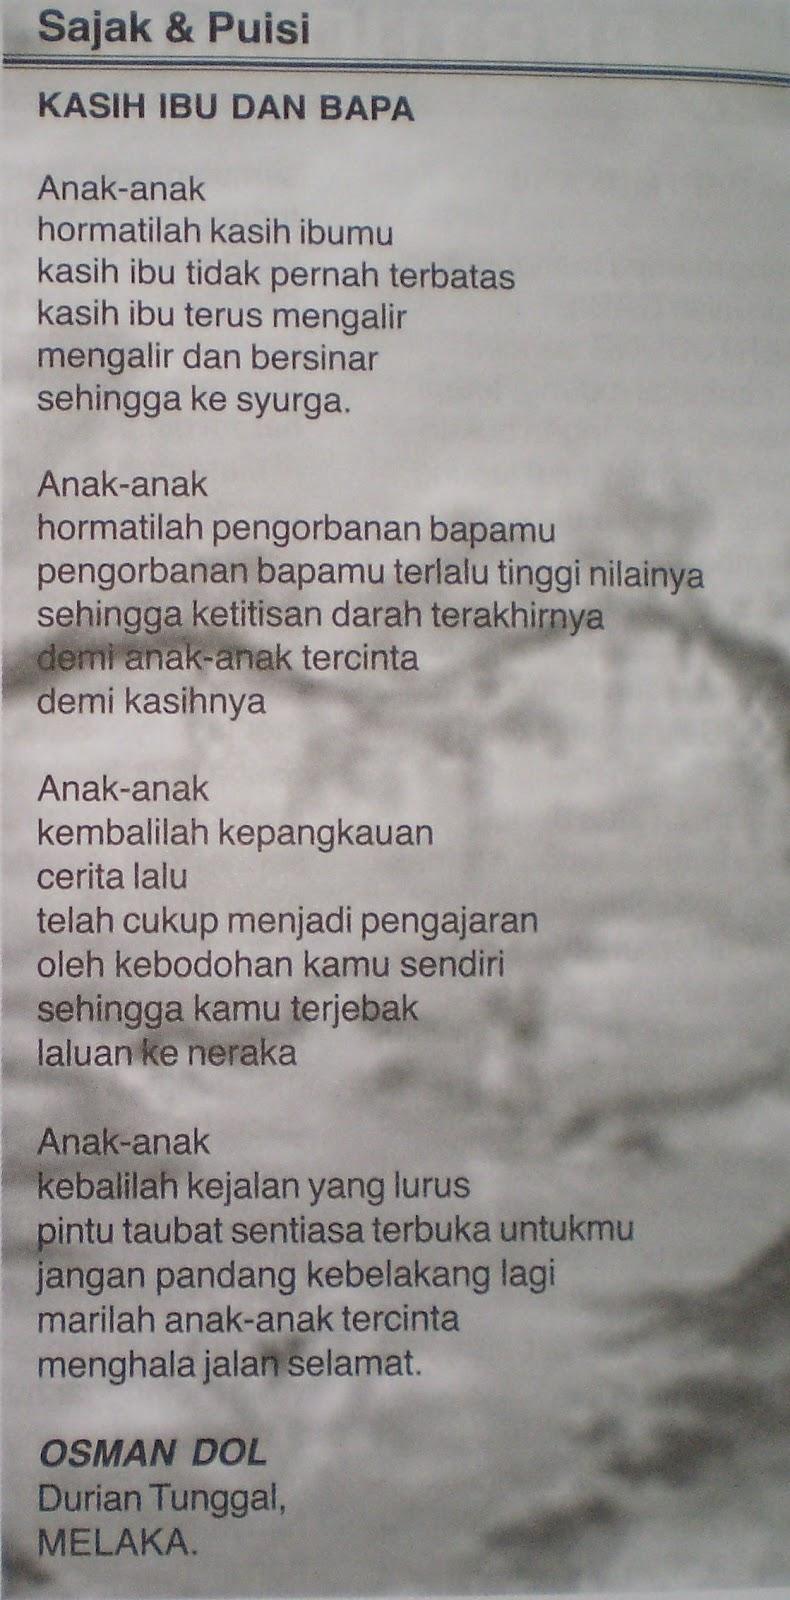 Sajak Ibu dan Bapa | Seronoknya Belajar Bahasa Melayu....